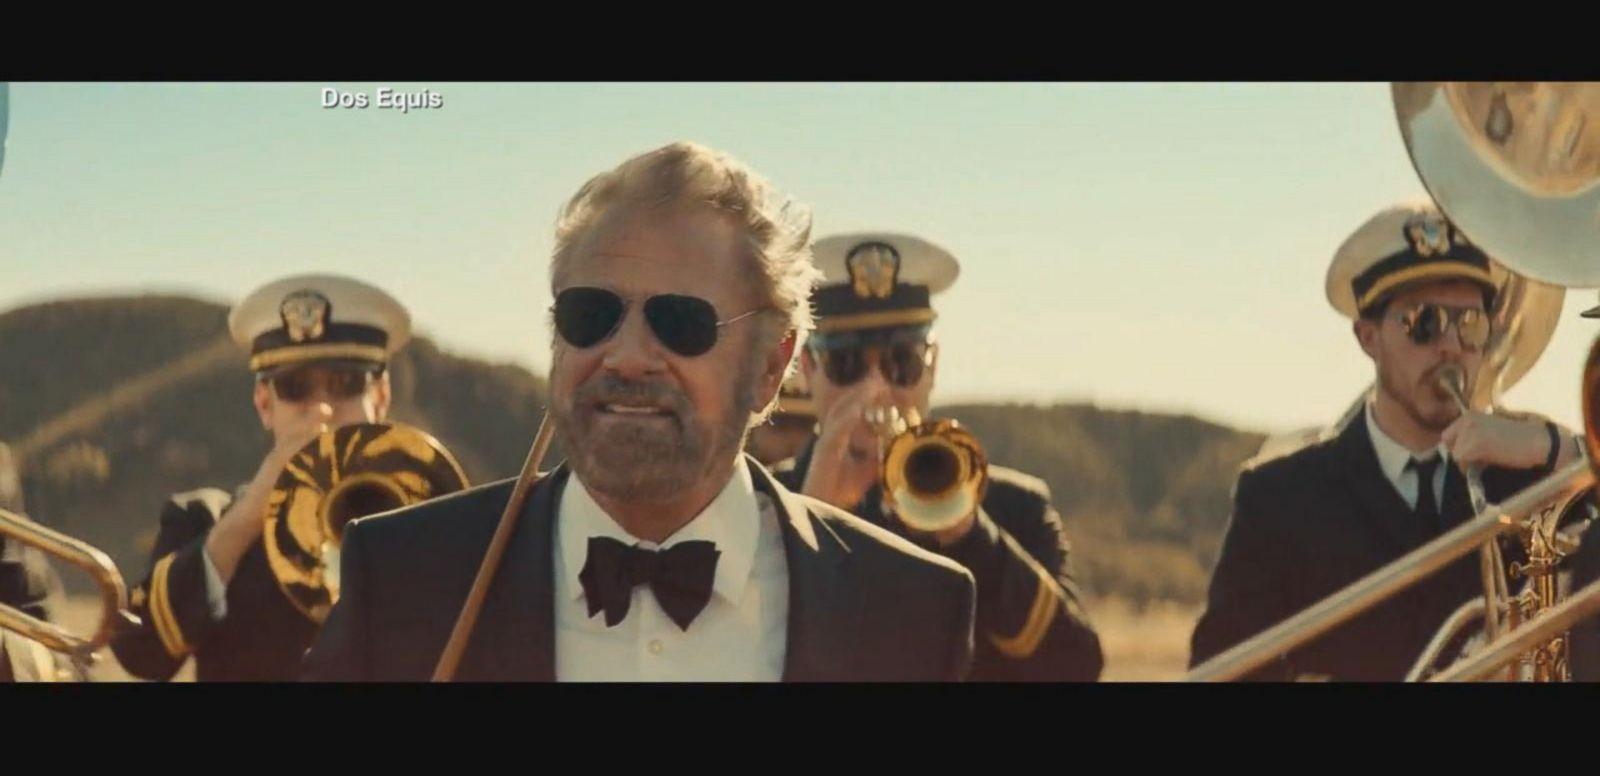 VIDEO: Most Interesting Man Retiring as Dos Equis Spokesperson